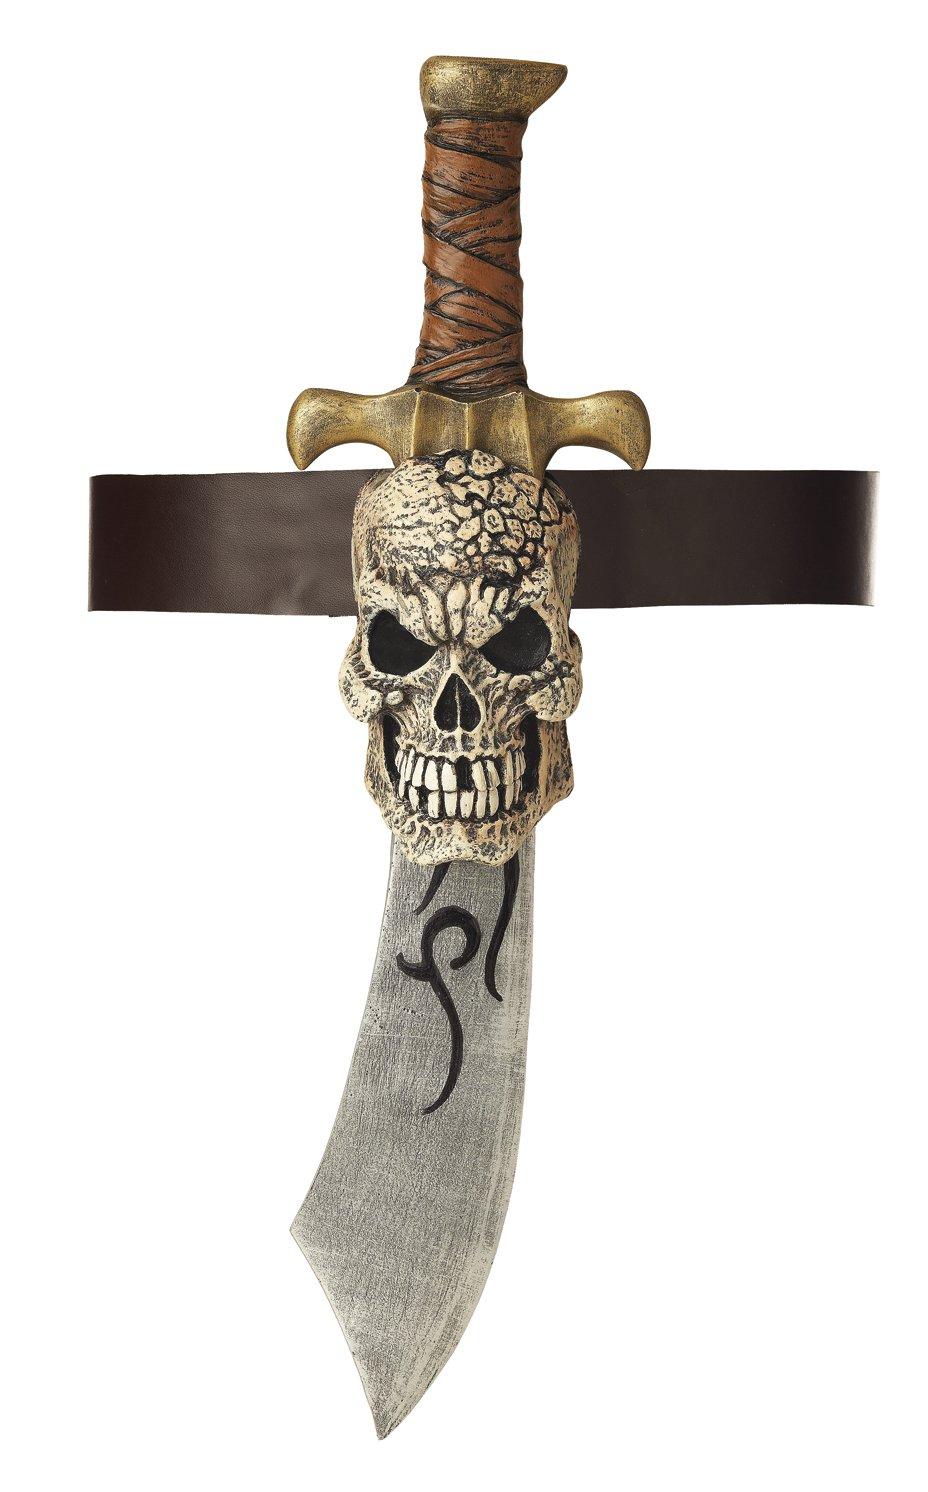 Pirate Sword & Skull Sheath Costume Toy Weapon